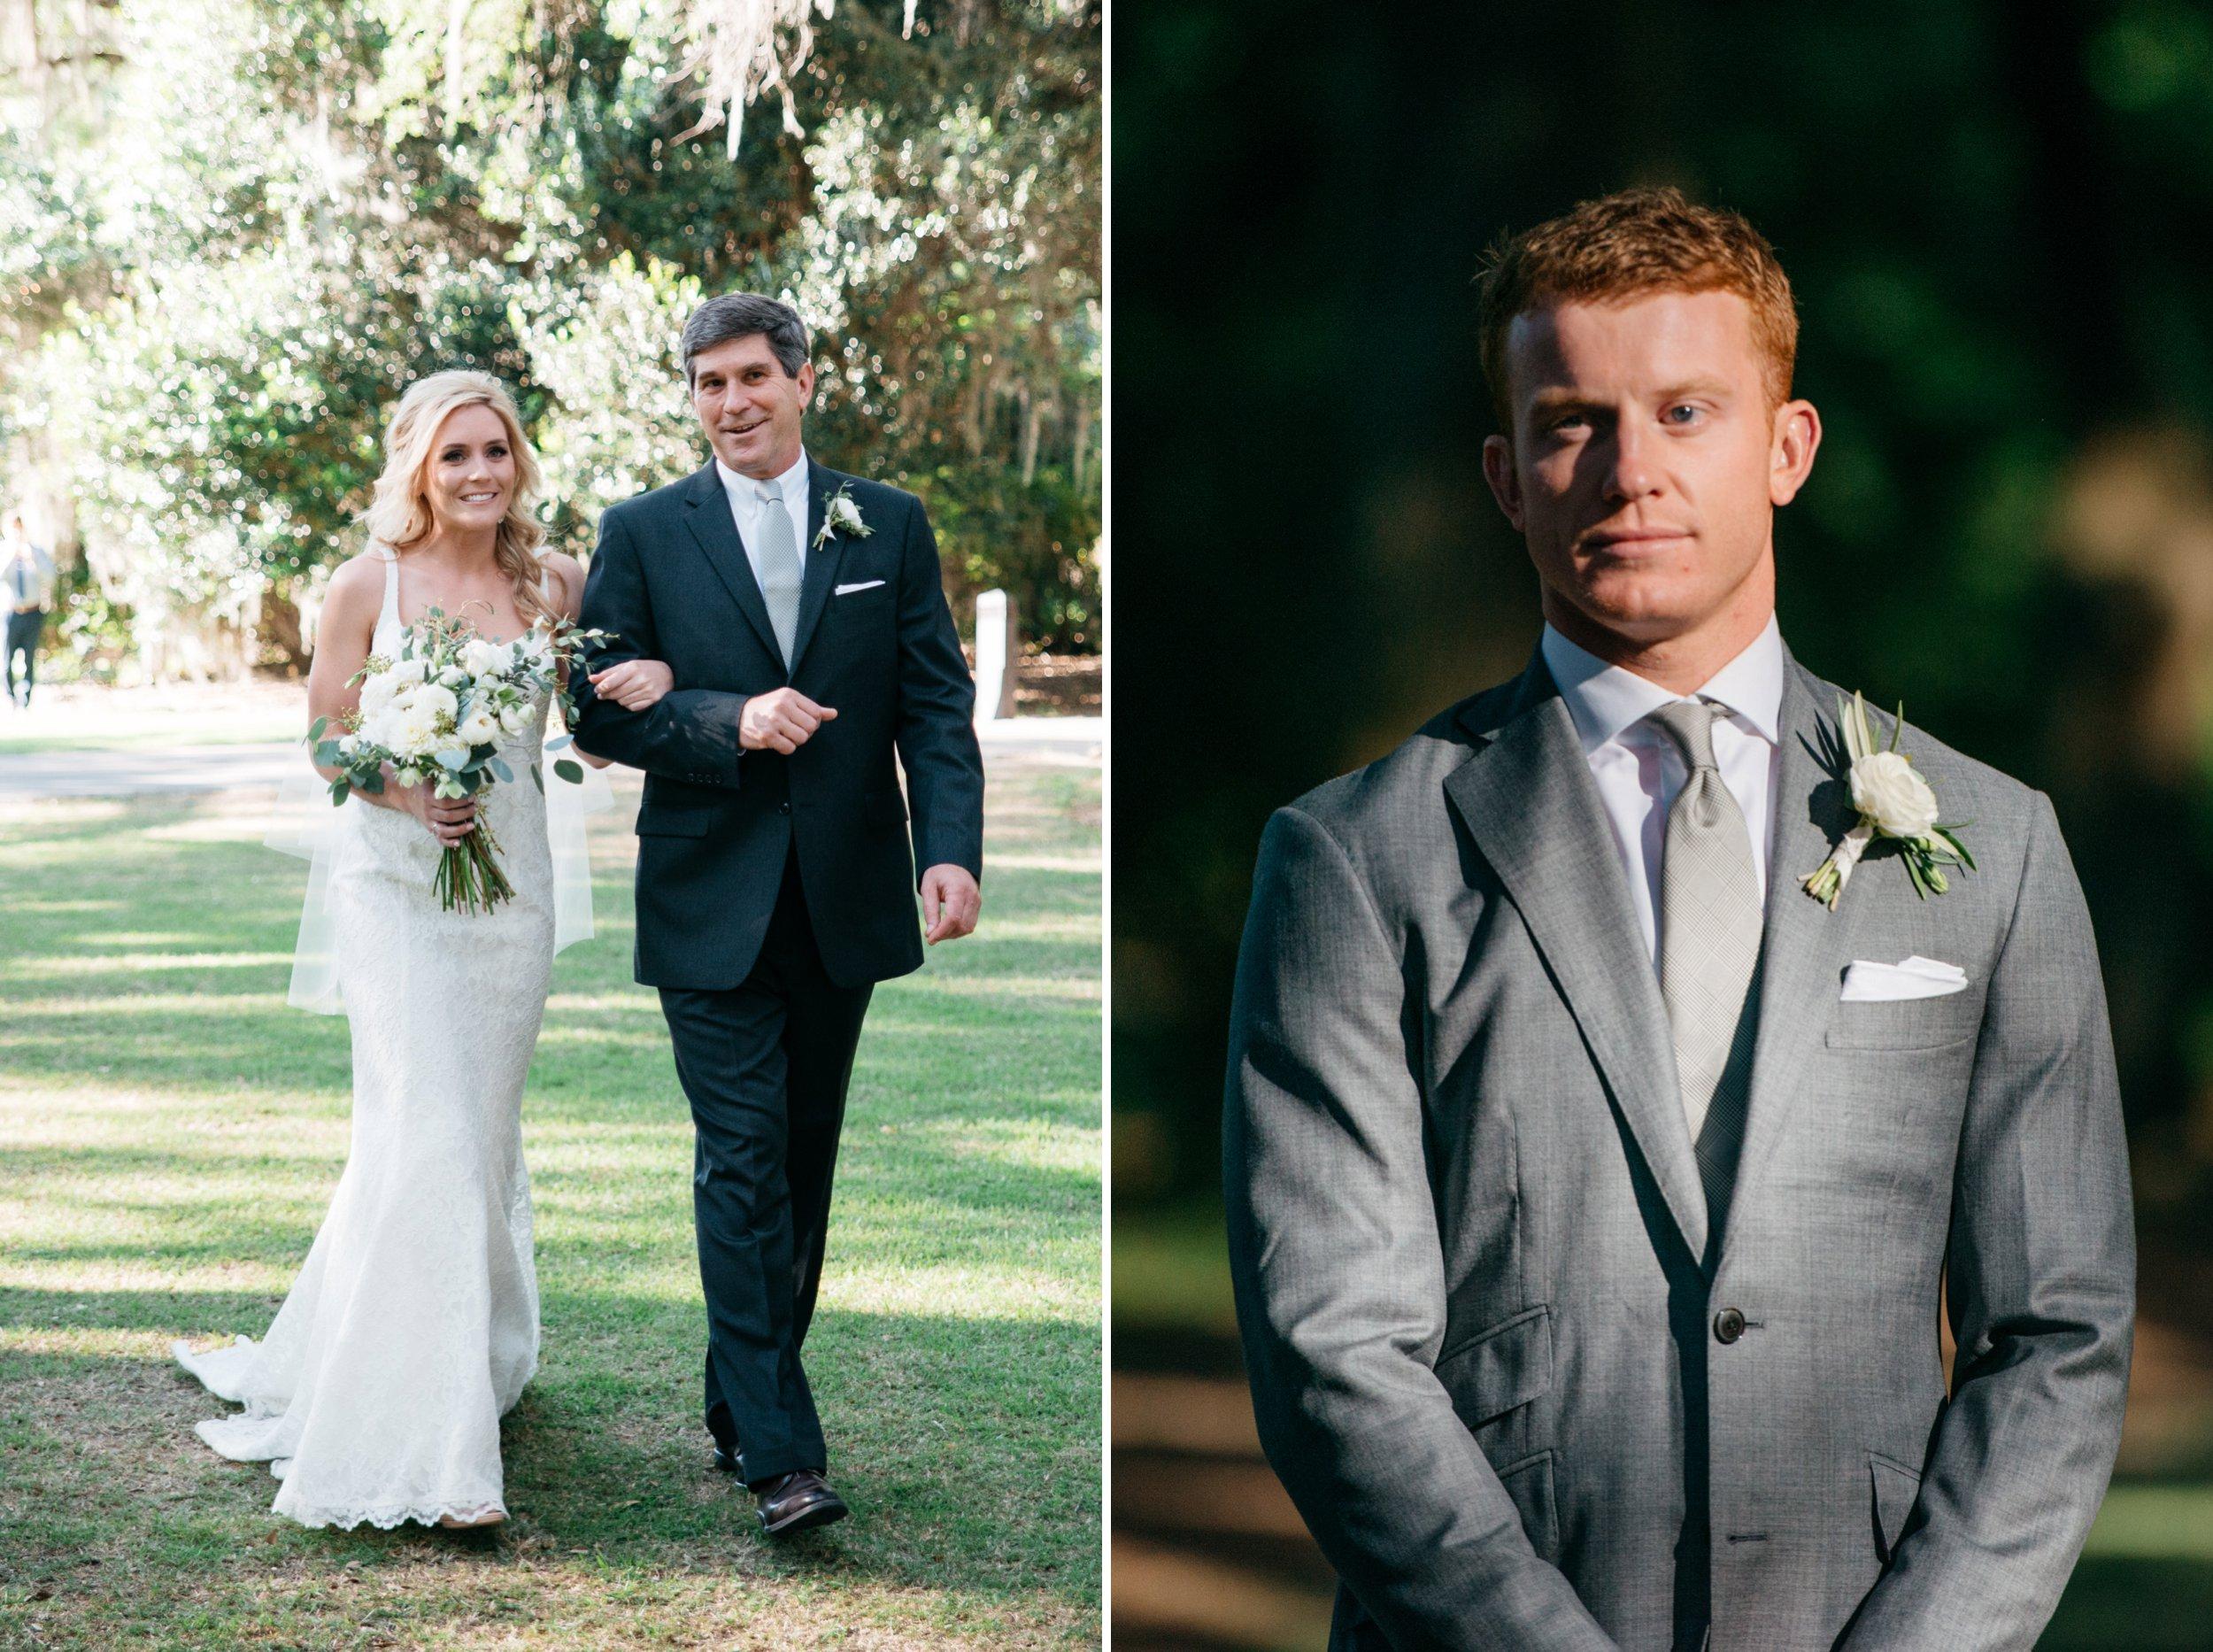 legare-waring-house-wedding-31.jpg